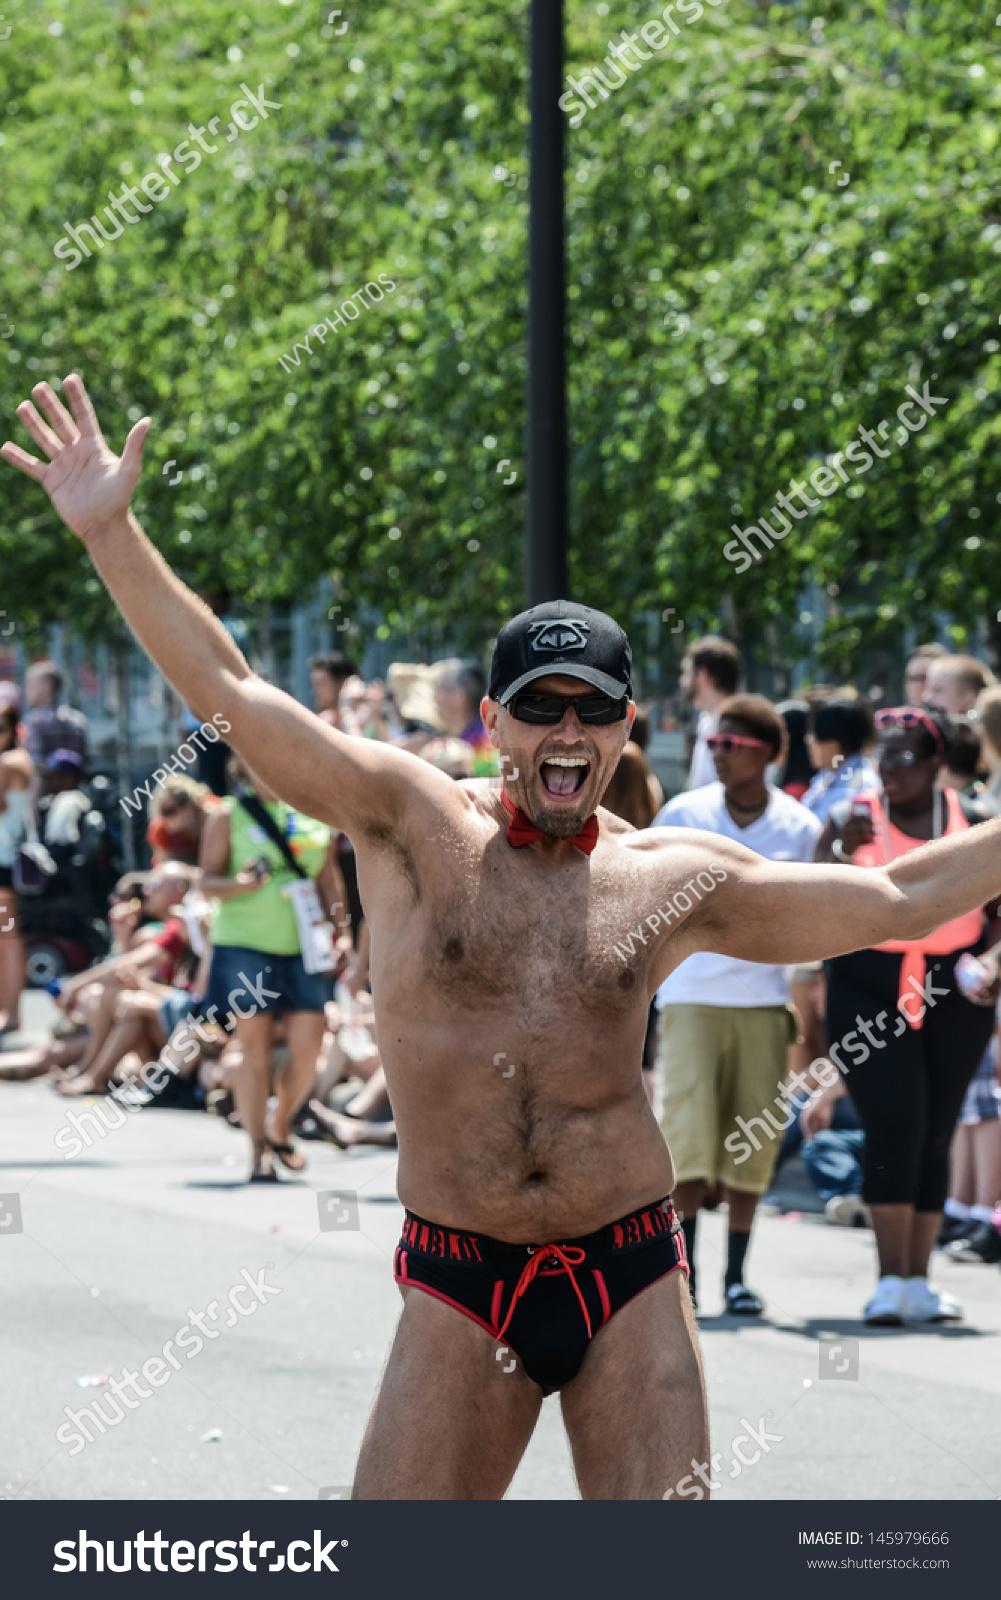 Duluth Gay Pride 2016 - Superior Gay